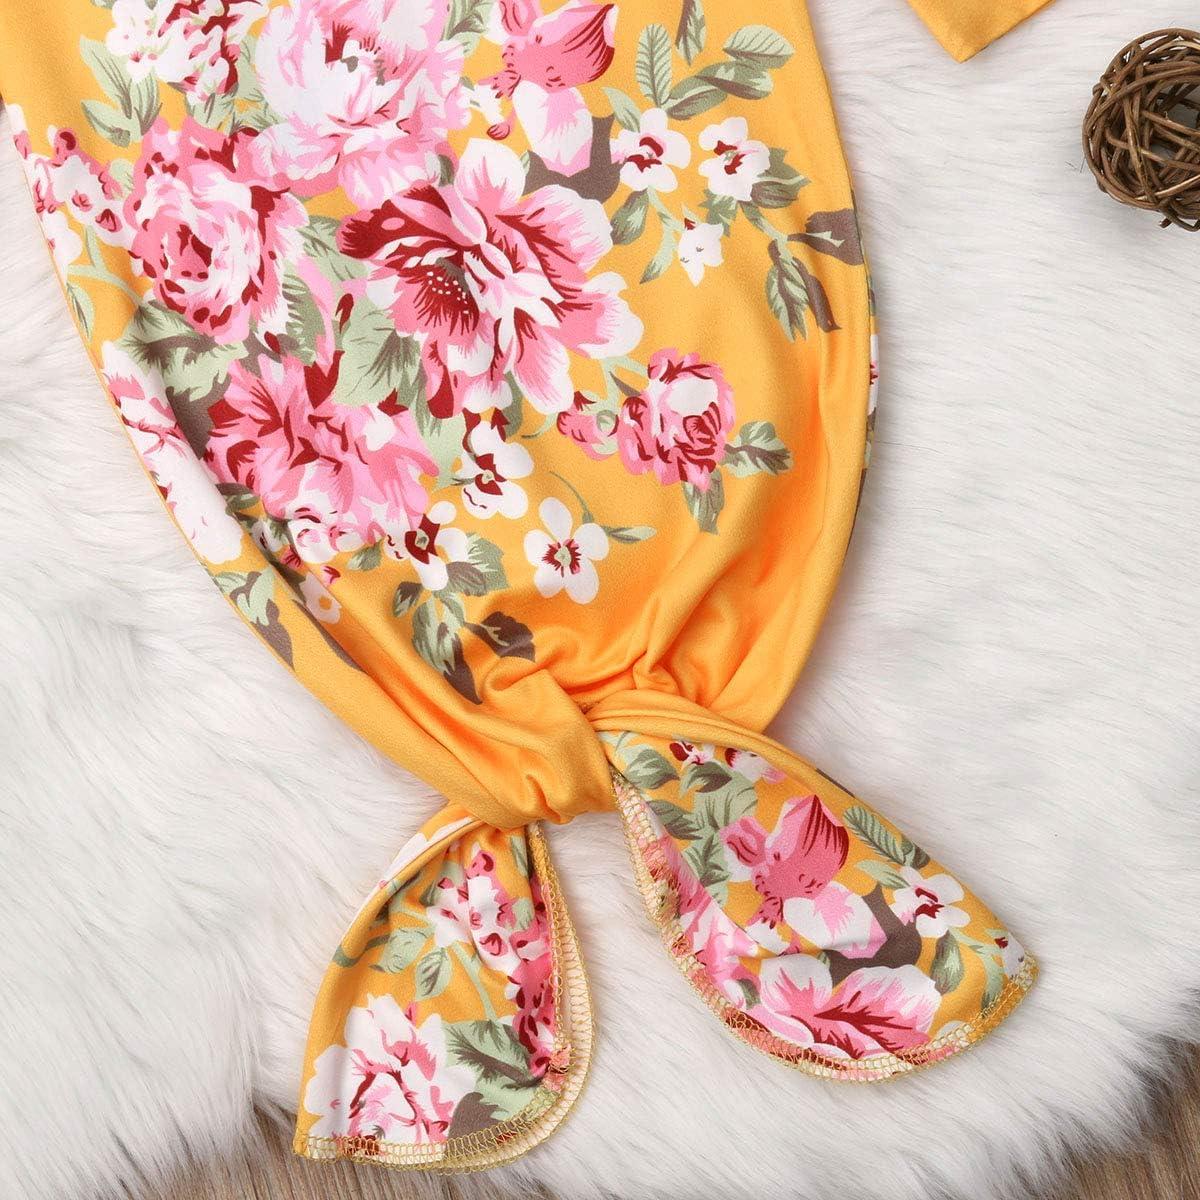 AndPannDy Newborn Baby Boys Girls Cotton Sleeping Robe Nightgowns Sleepwear Romper Sleep Gowns+Hat//Headband 0-6M